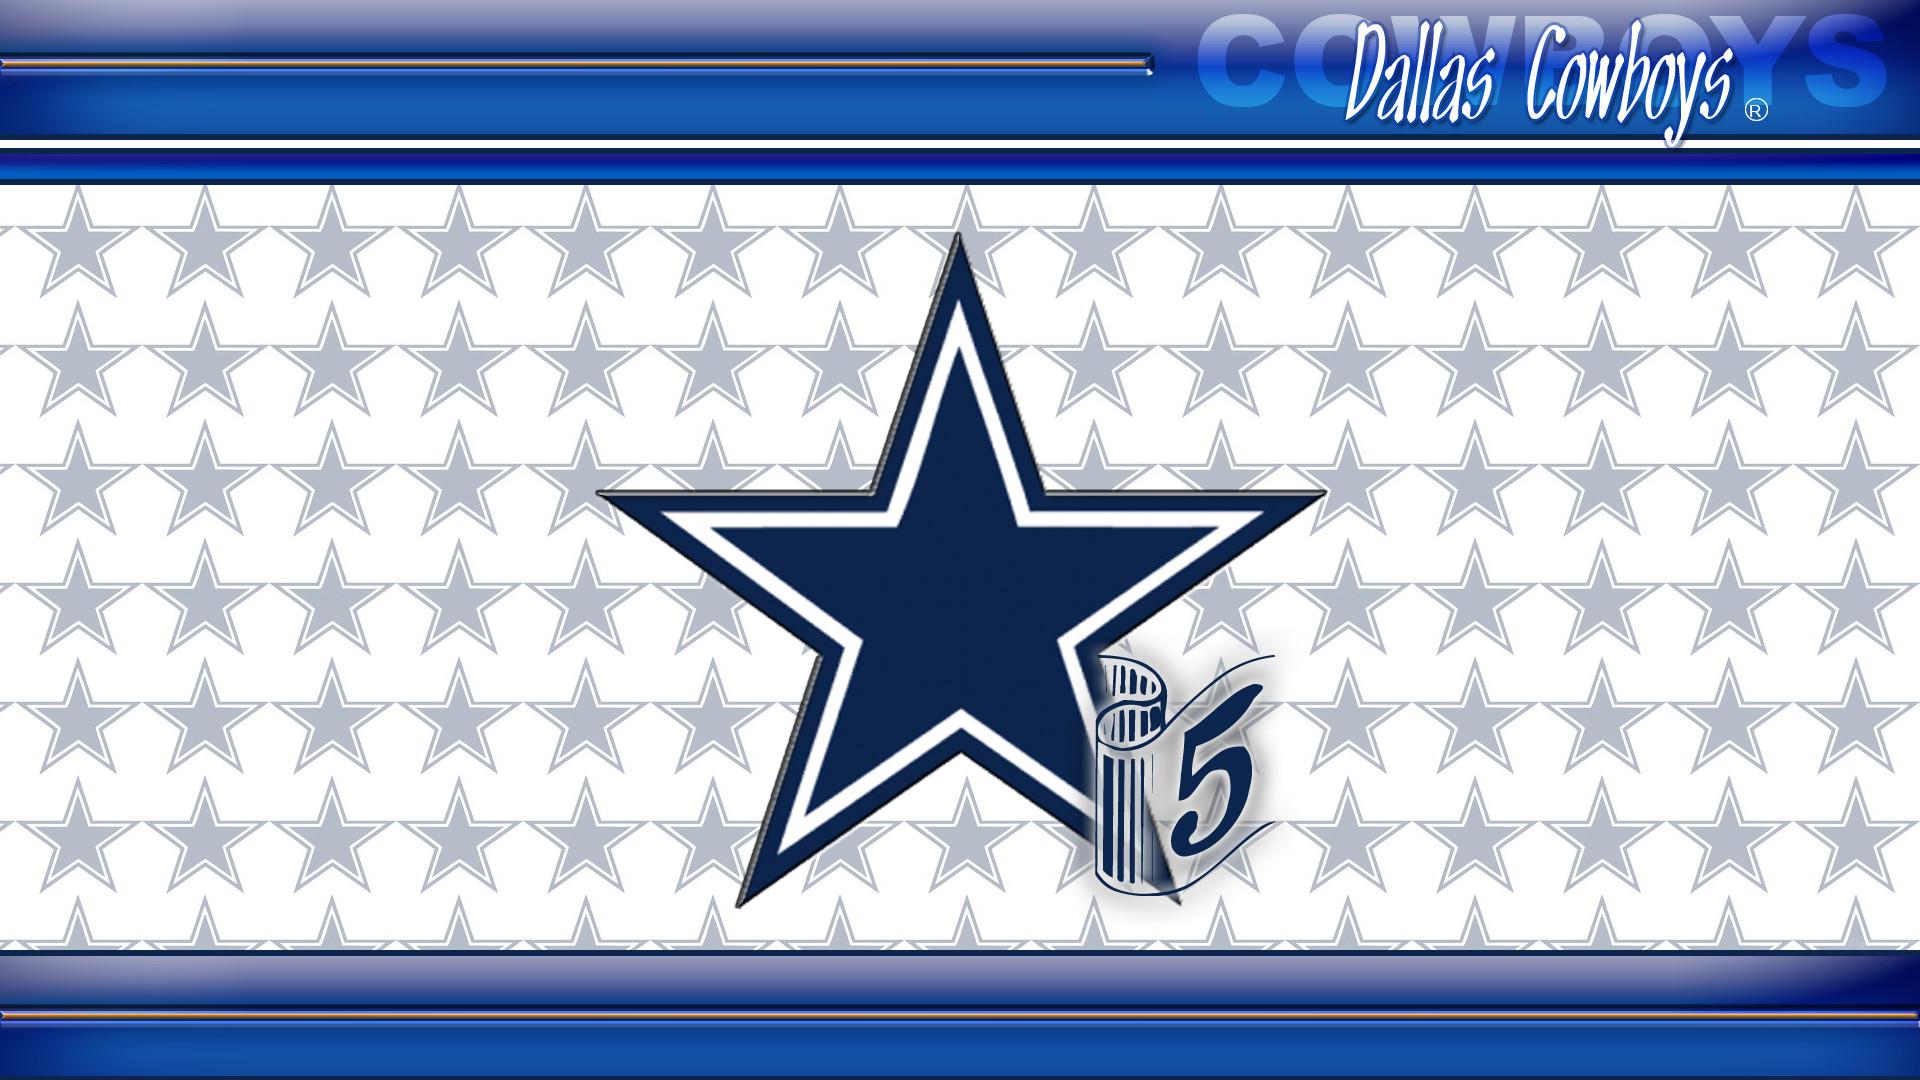 Dallas Cowboys Desktop Background Wallpaper – Www.